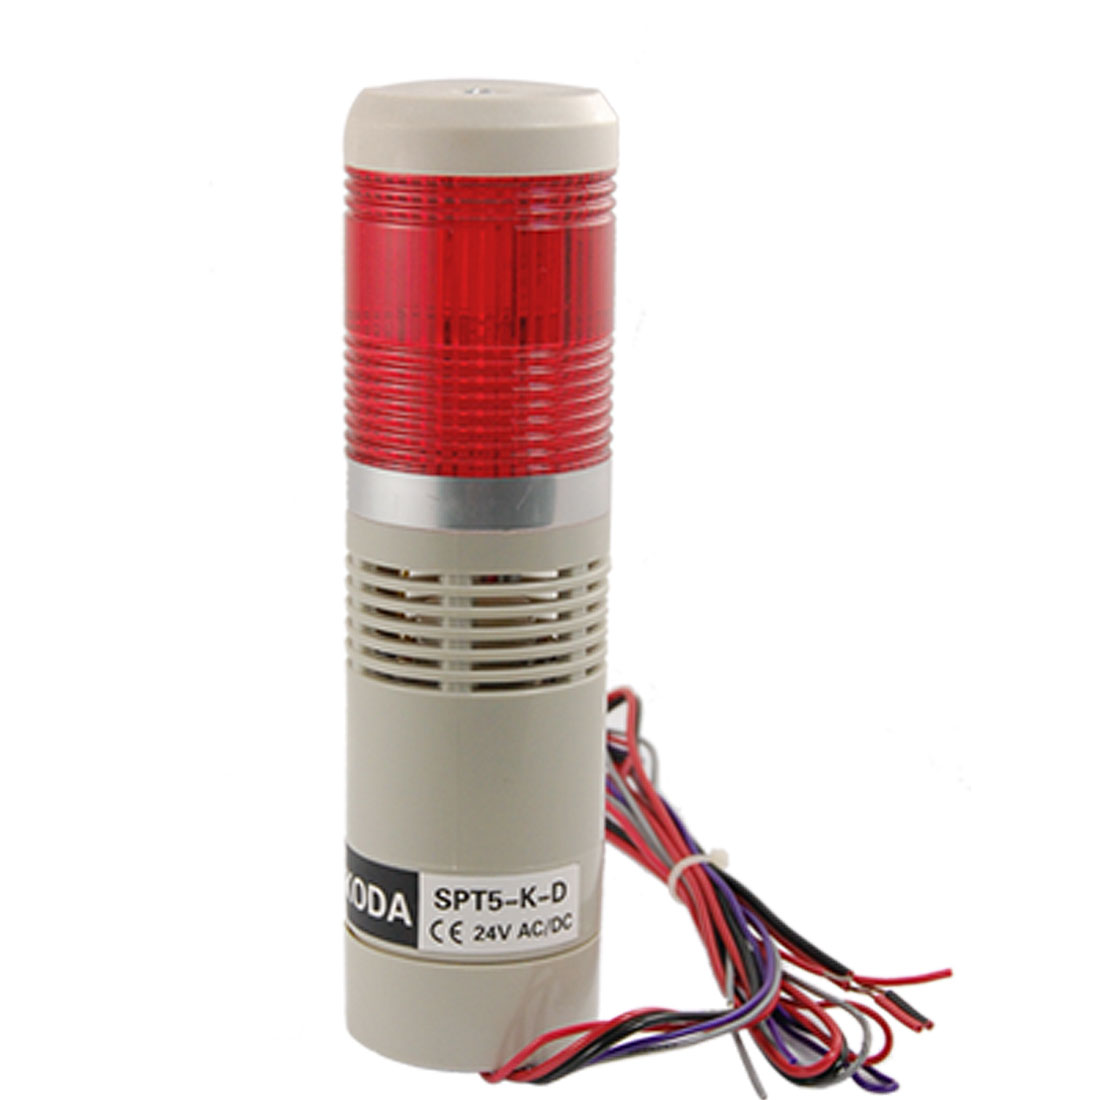 Industrial Signal Saftey Light Red Flashing Alarm Lamp Buzzer AC/DC 24V 90dB